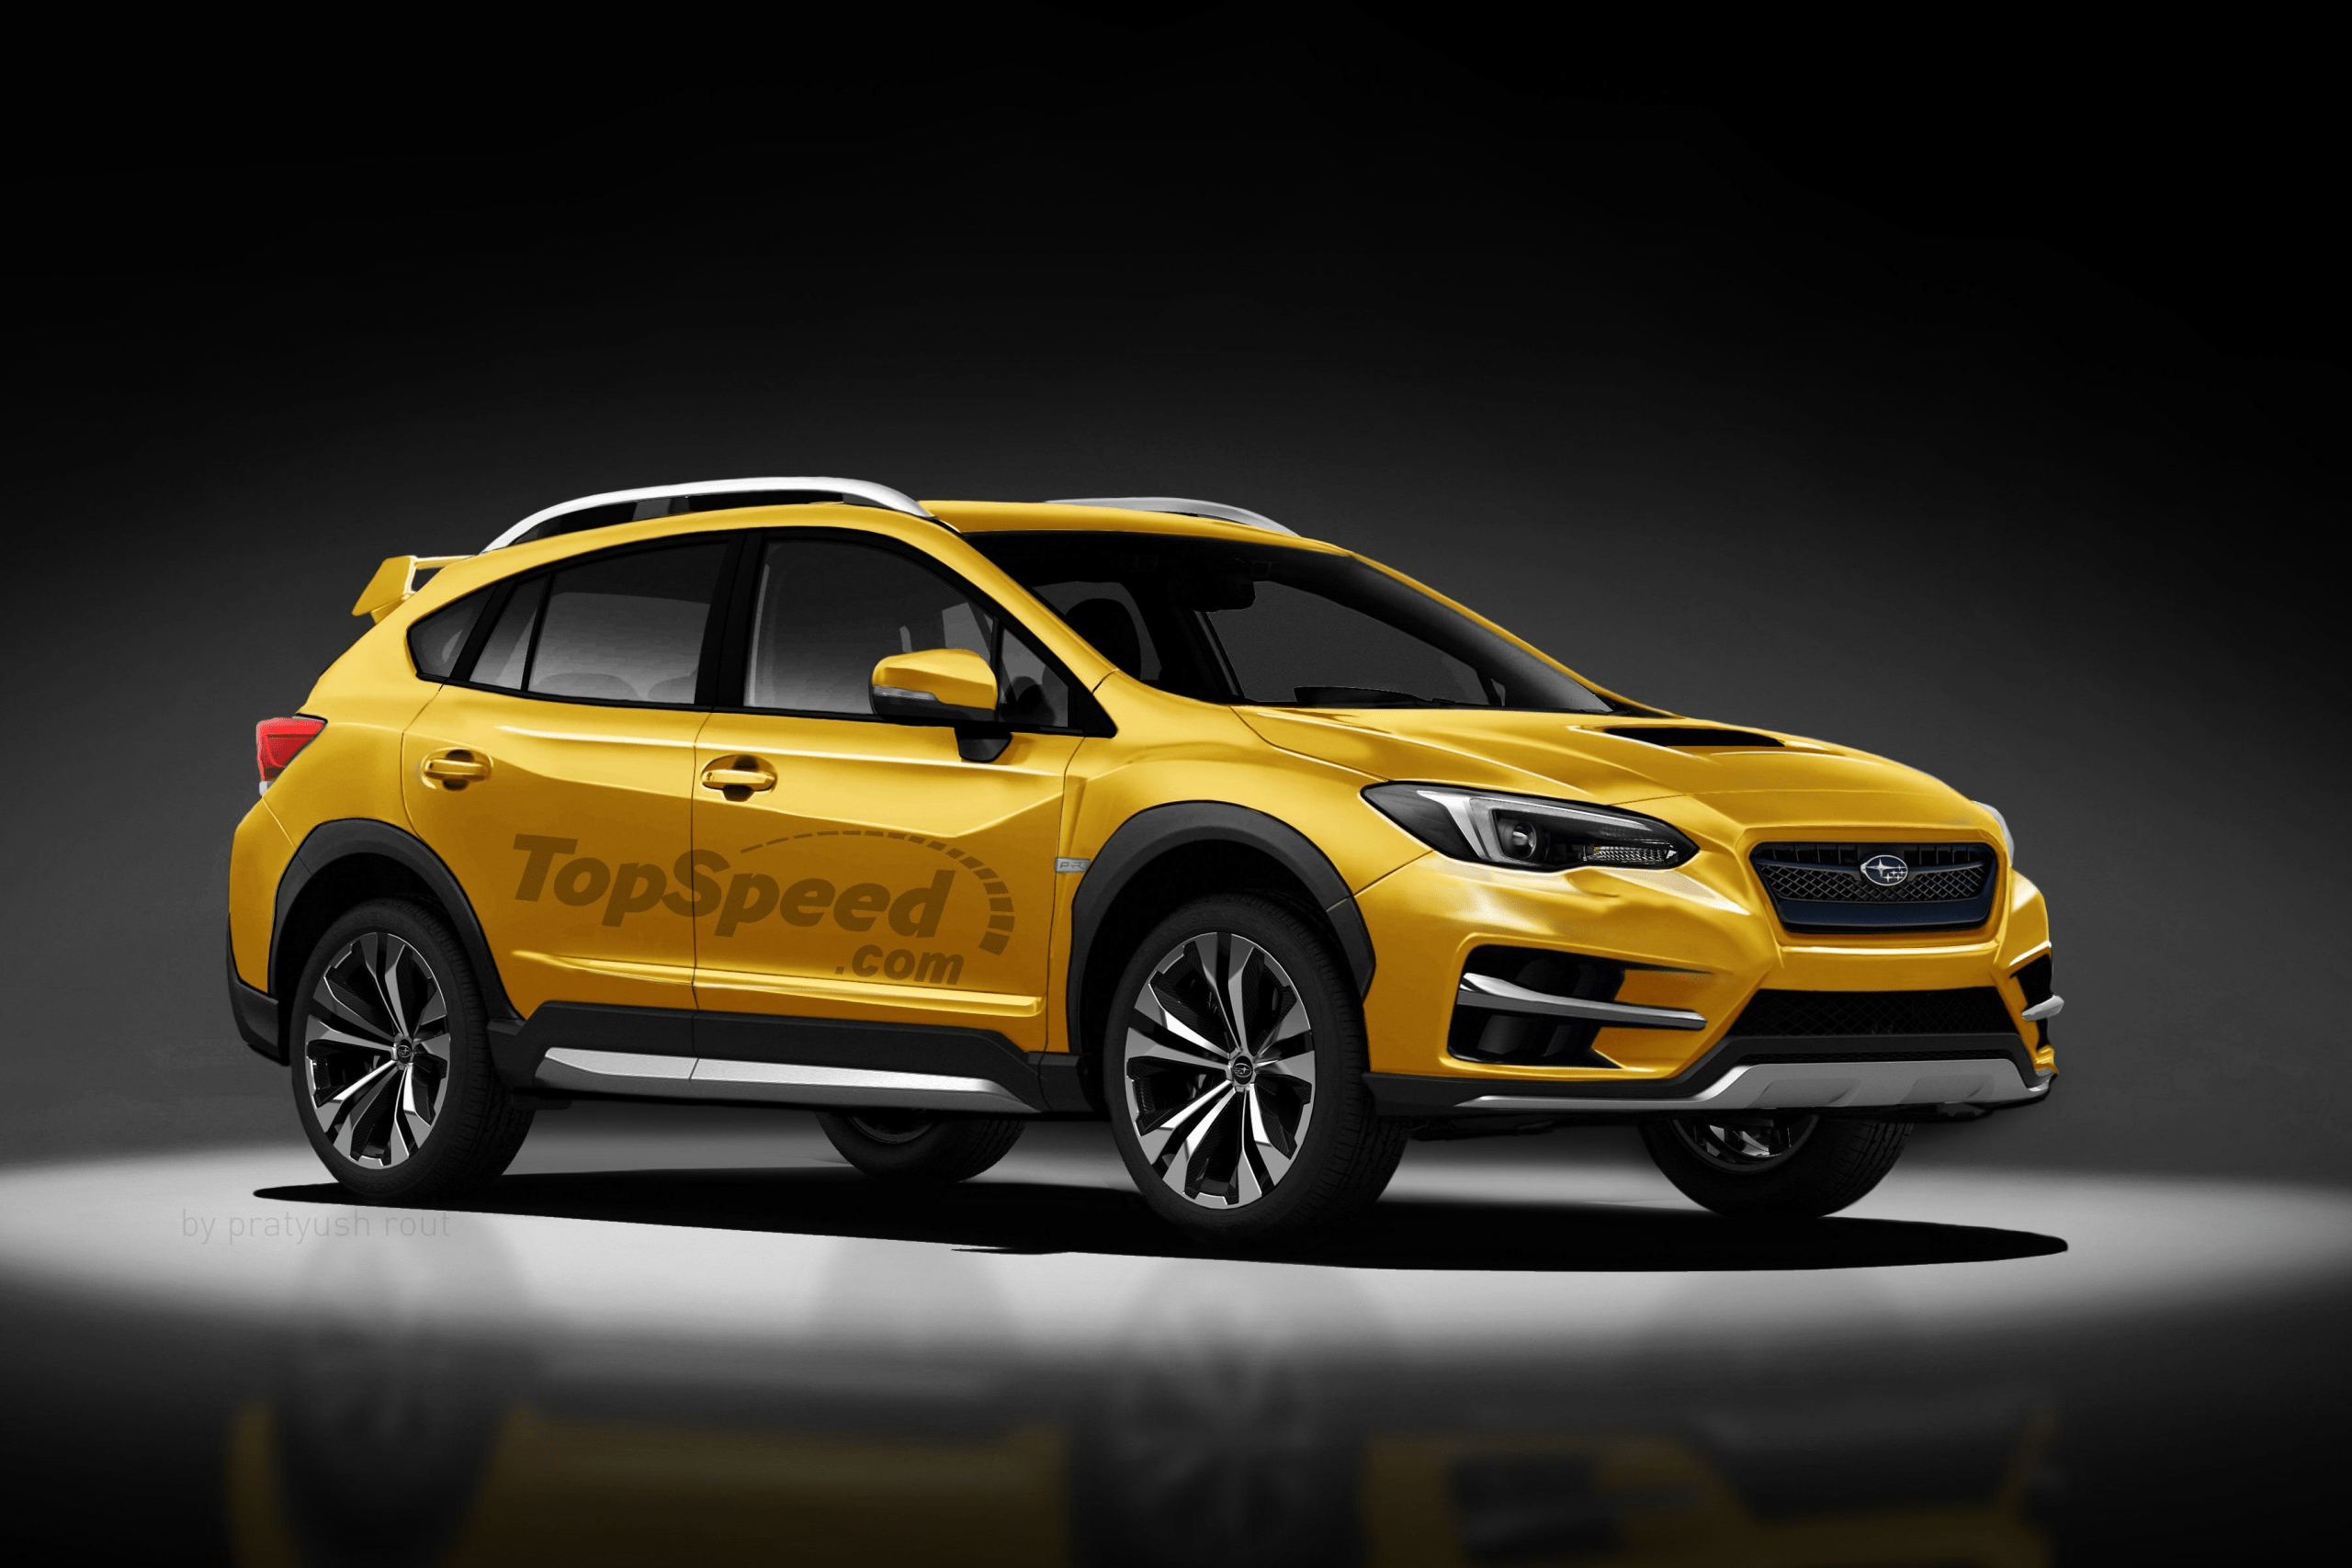 2020 Subaru Outback Turbo Hybrid Rumors In 2020 Subaru Crosstrek Subaru Outback Subaru